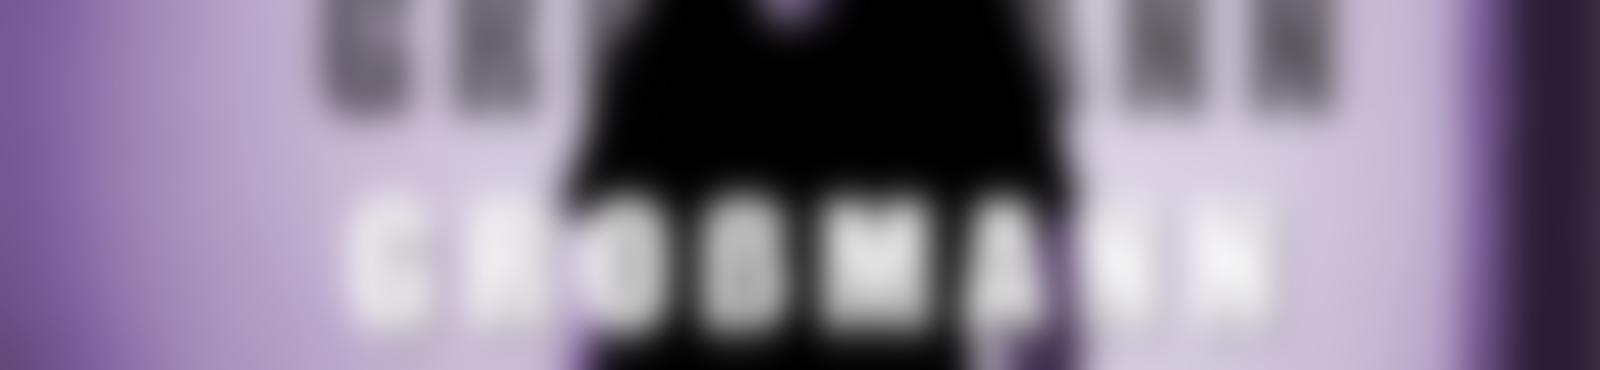 Blurred a42a2ad8 b8c1 4a24 bce2 be6f476de04b